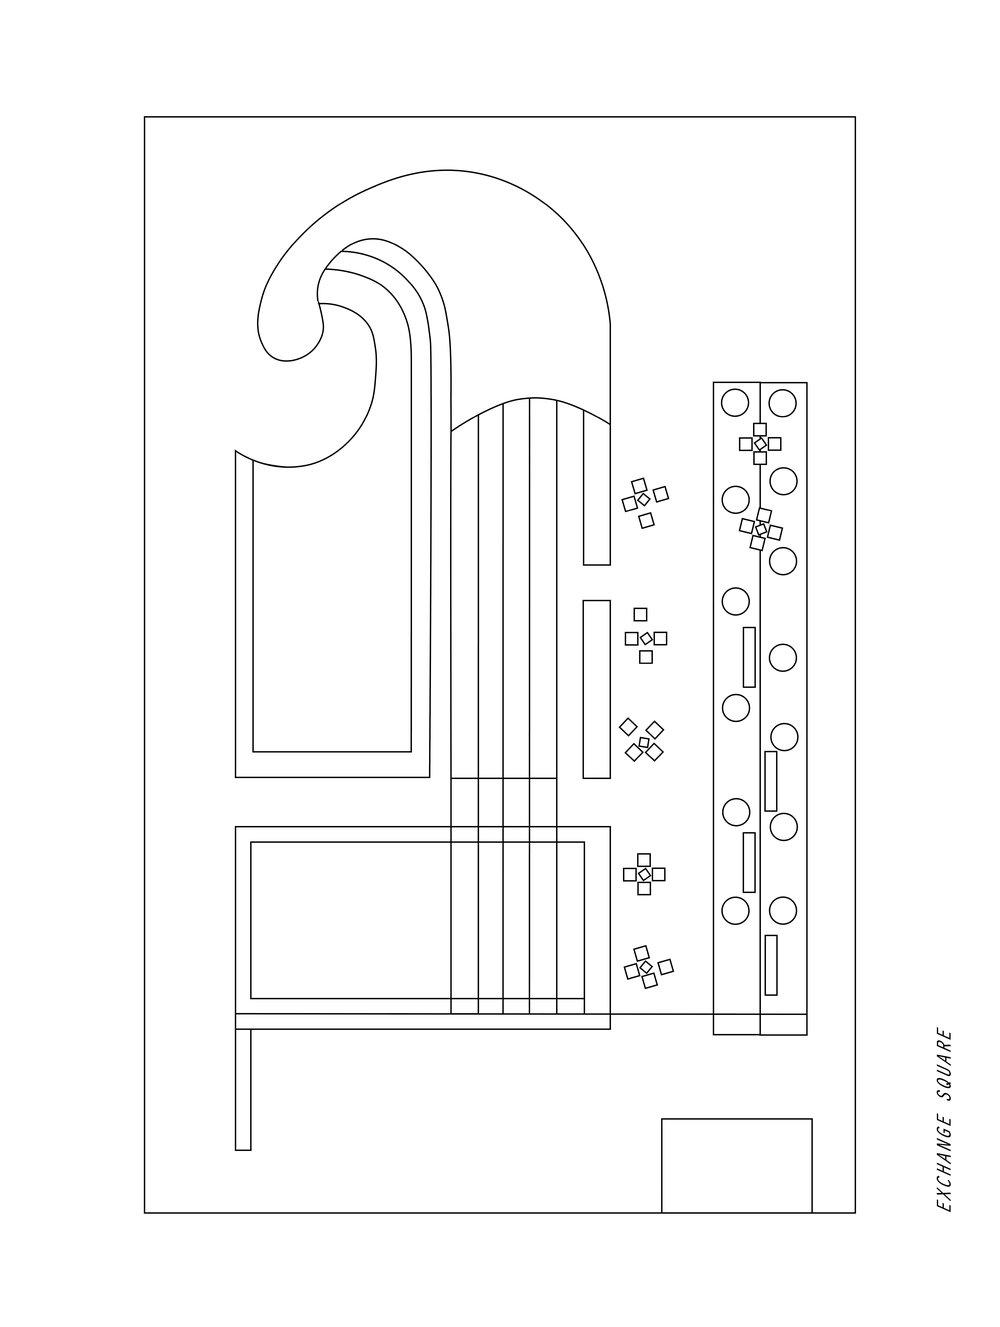 second book4.jpg